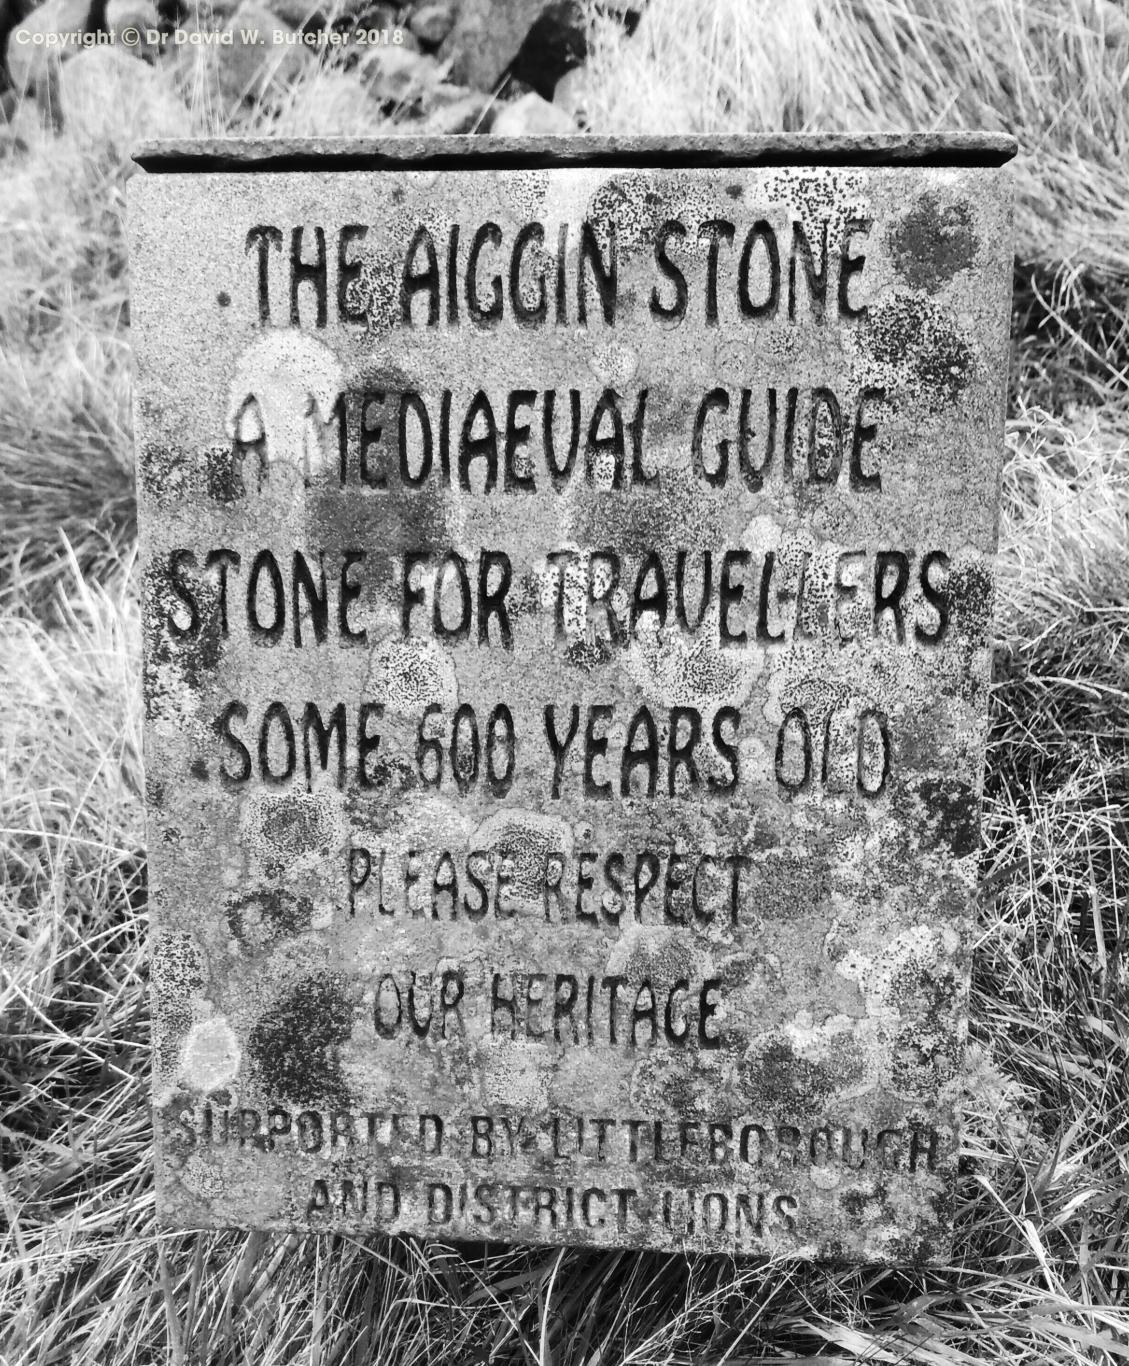 Aiggin Stone information sign on Blackstone Edge on Pennine Way